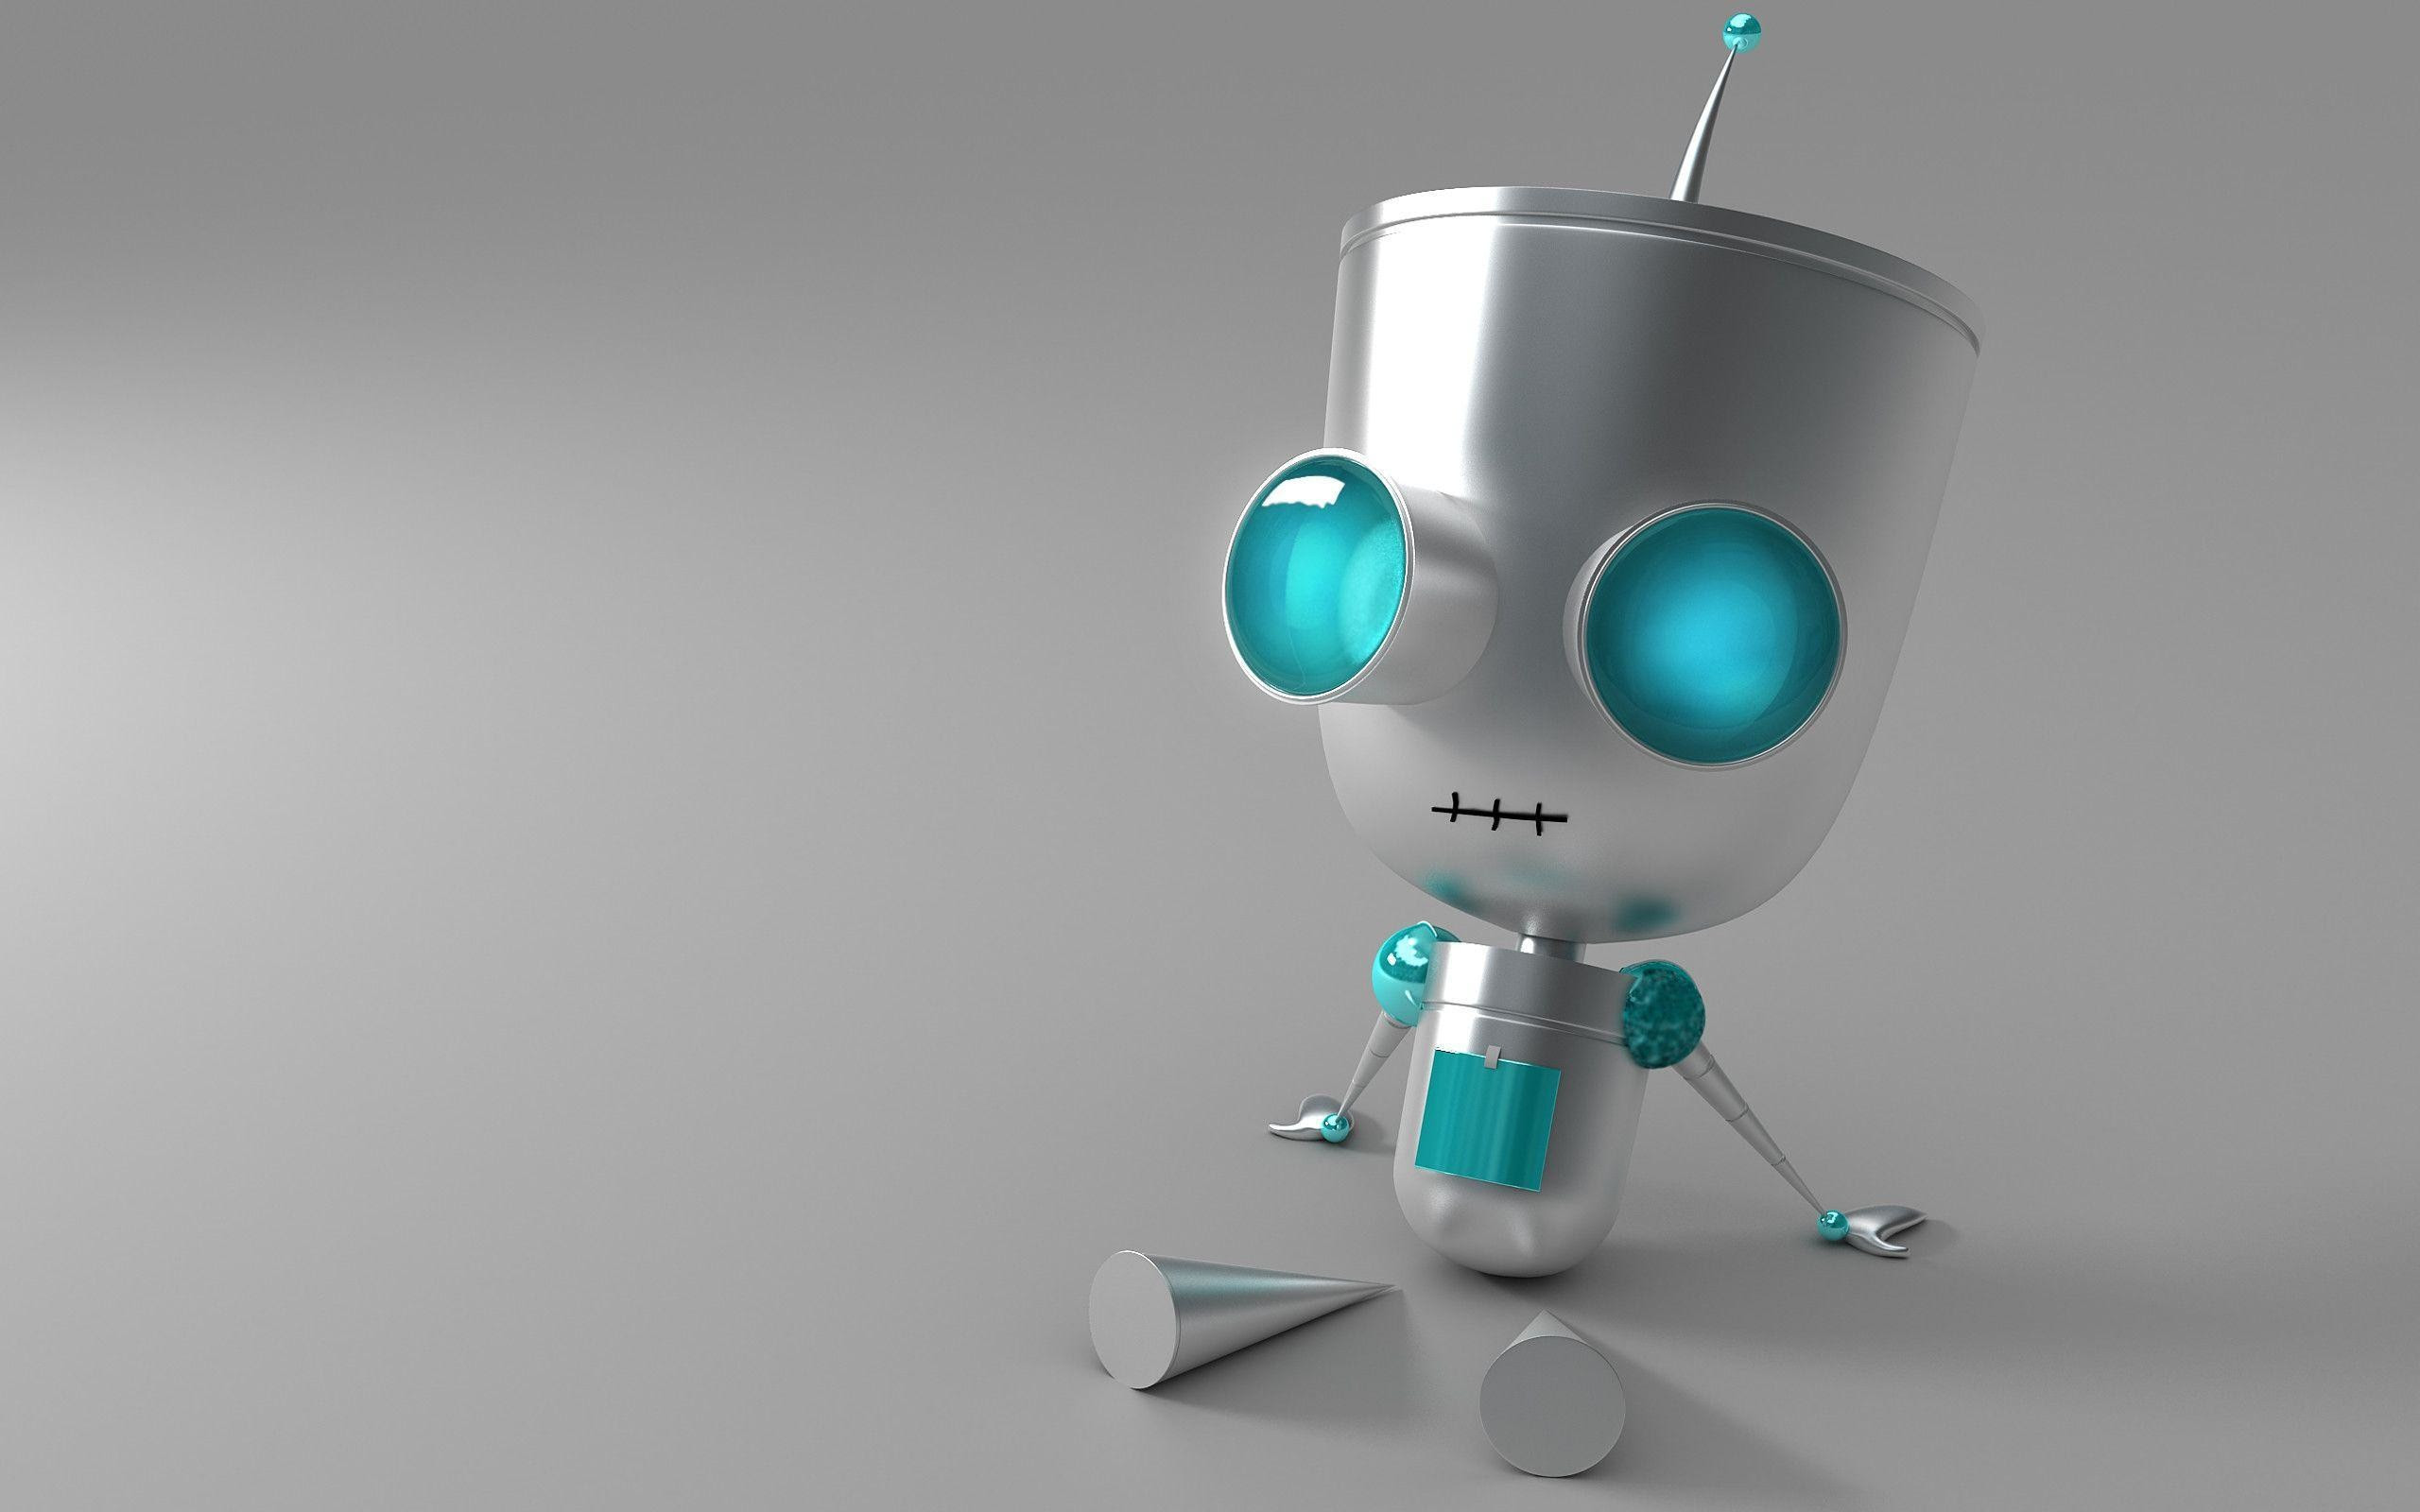 Cute Robot Wallpaper 71 Images